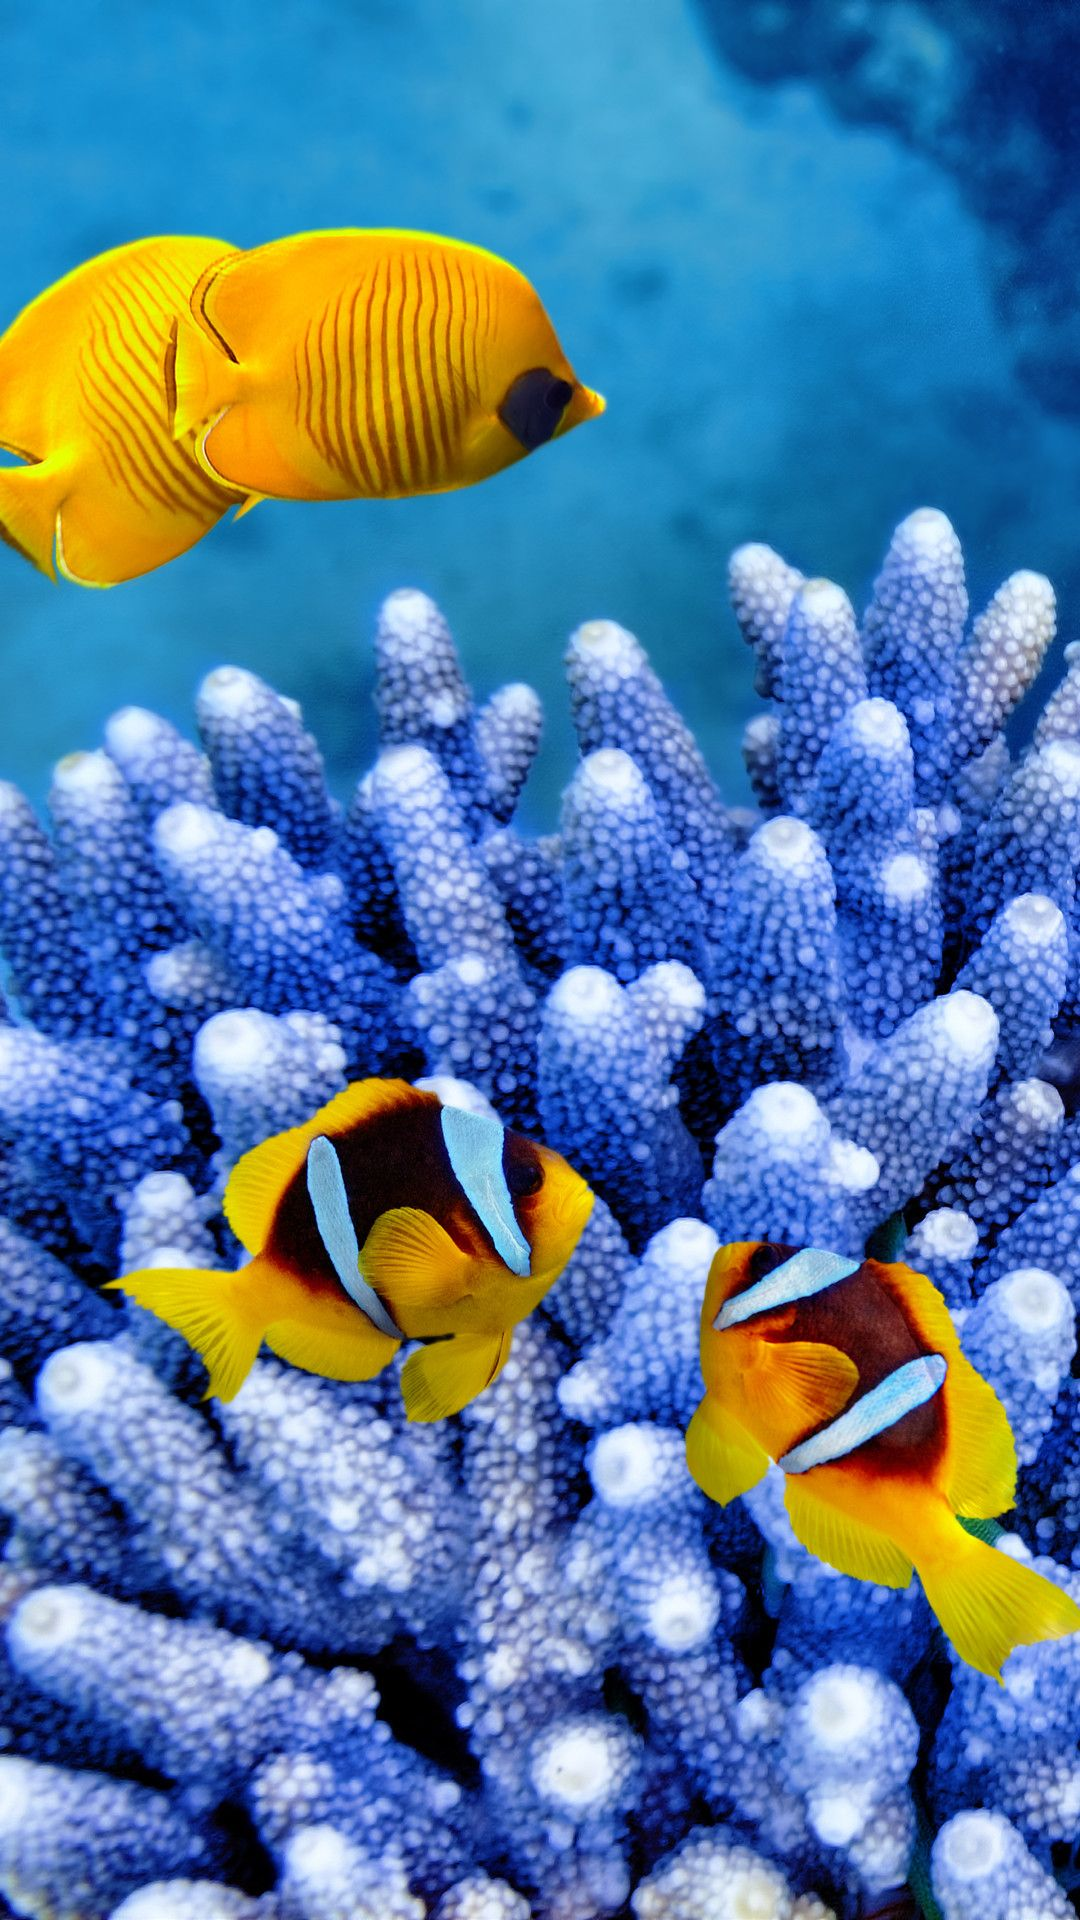 Iphone Clownfish Wallpaper 4k Fish Wallpaper Iphone Fish Wallpaper Fish